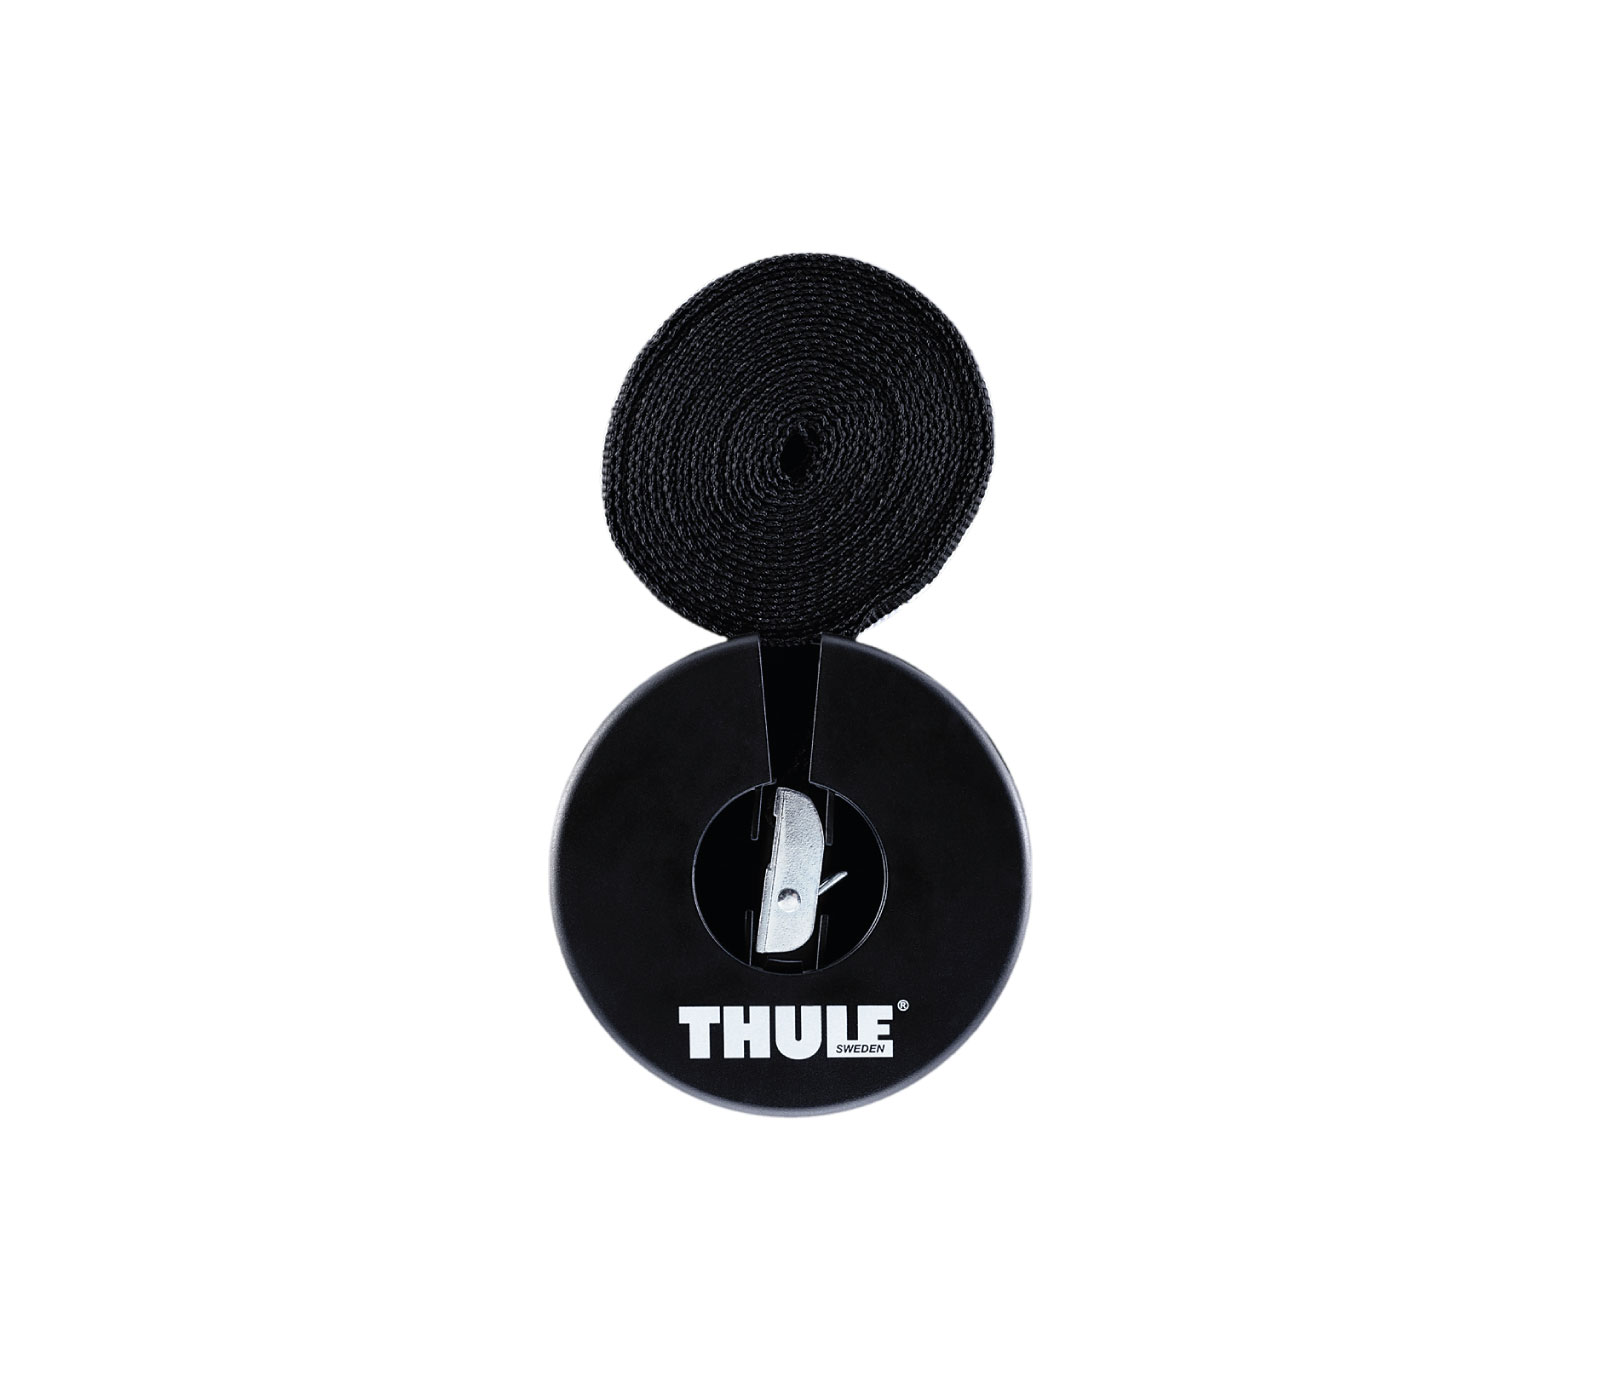 Thule Strapholder 275